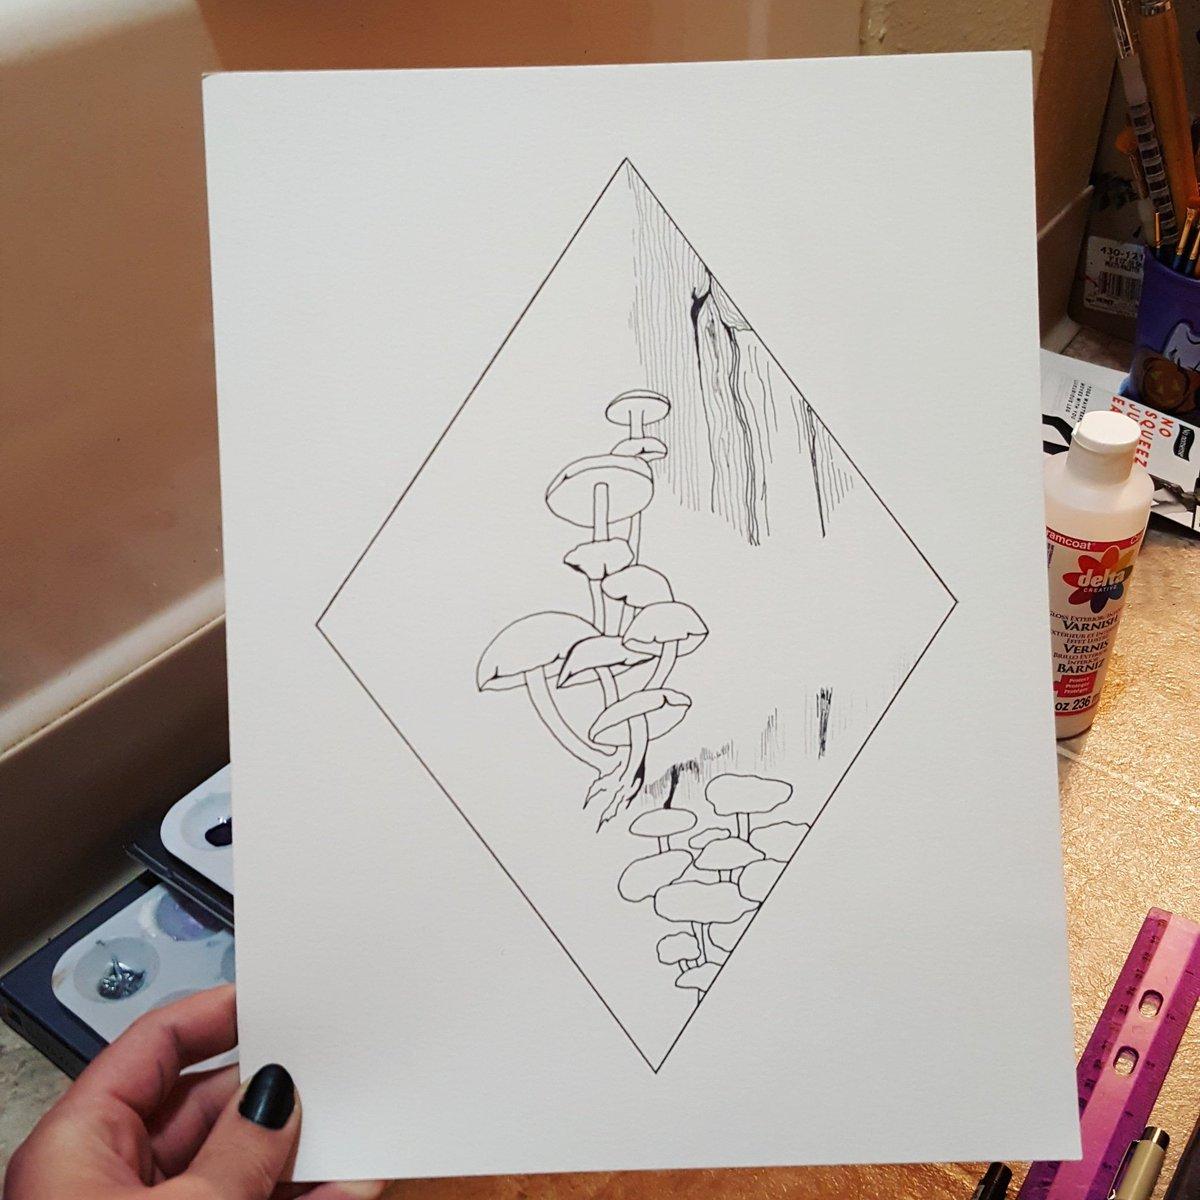 Maelie Jade On Twitter Inktober 14th Overgrown Painted With Watercolours Inktober Inktober2019 Inktober Mushrooms Watercolor Watercolorpainting Painting Https T Co Wpacakgrs4